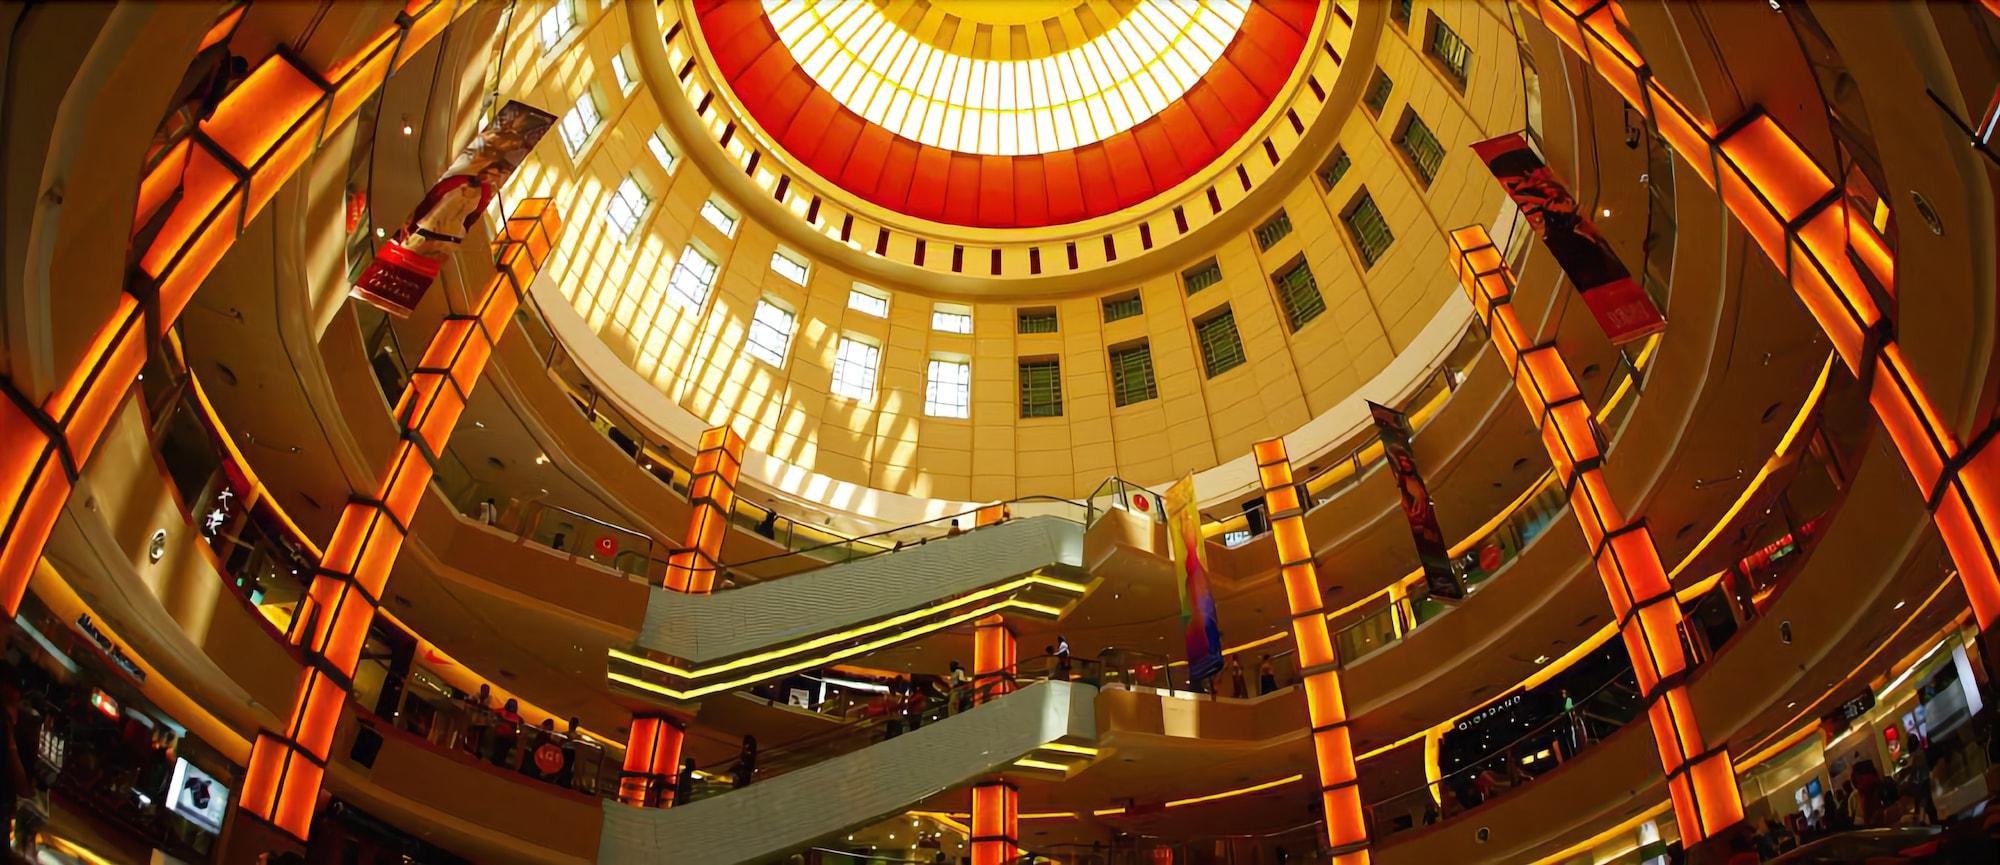 Sunway Resort Hotel & Spa, Kuala Lumpur